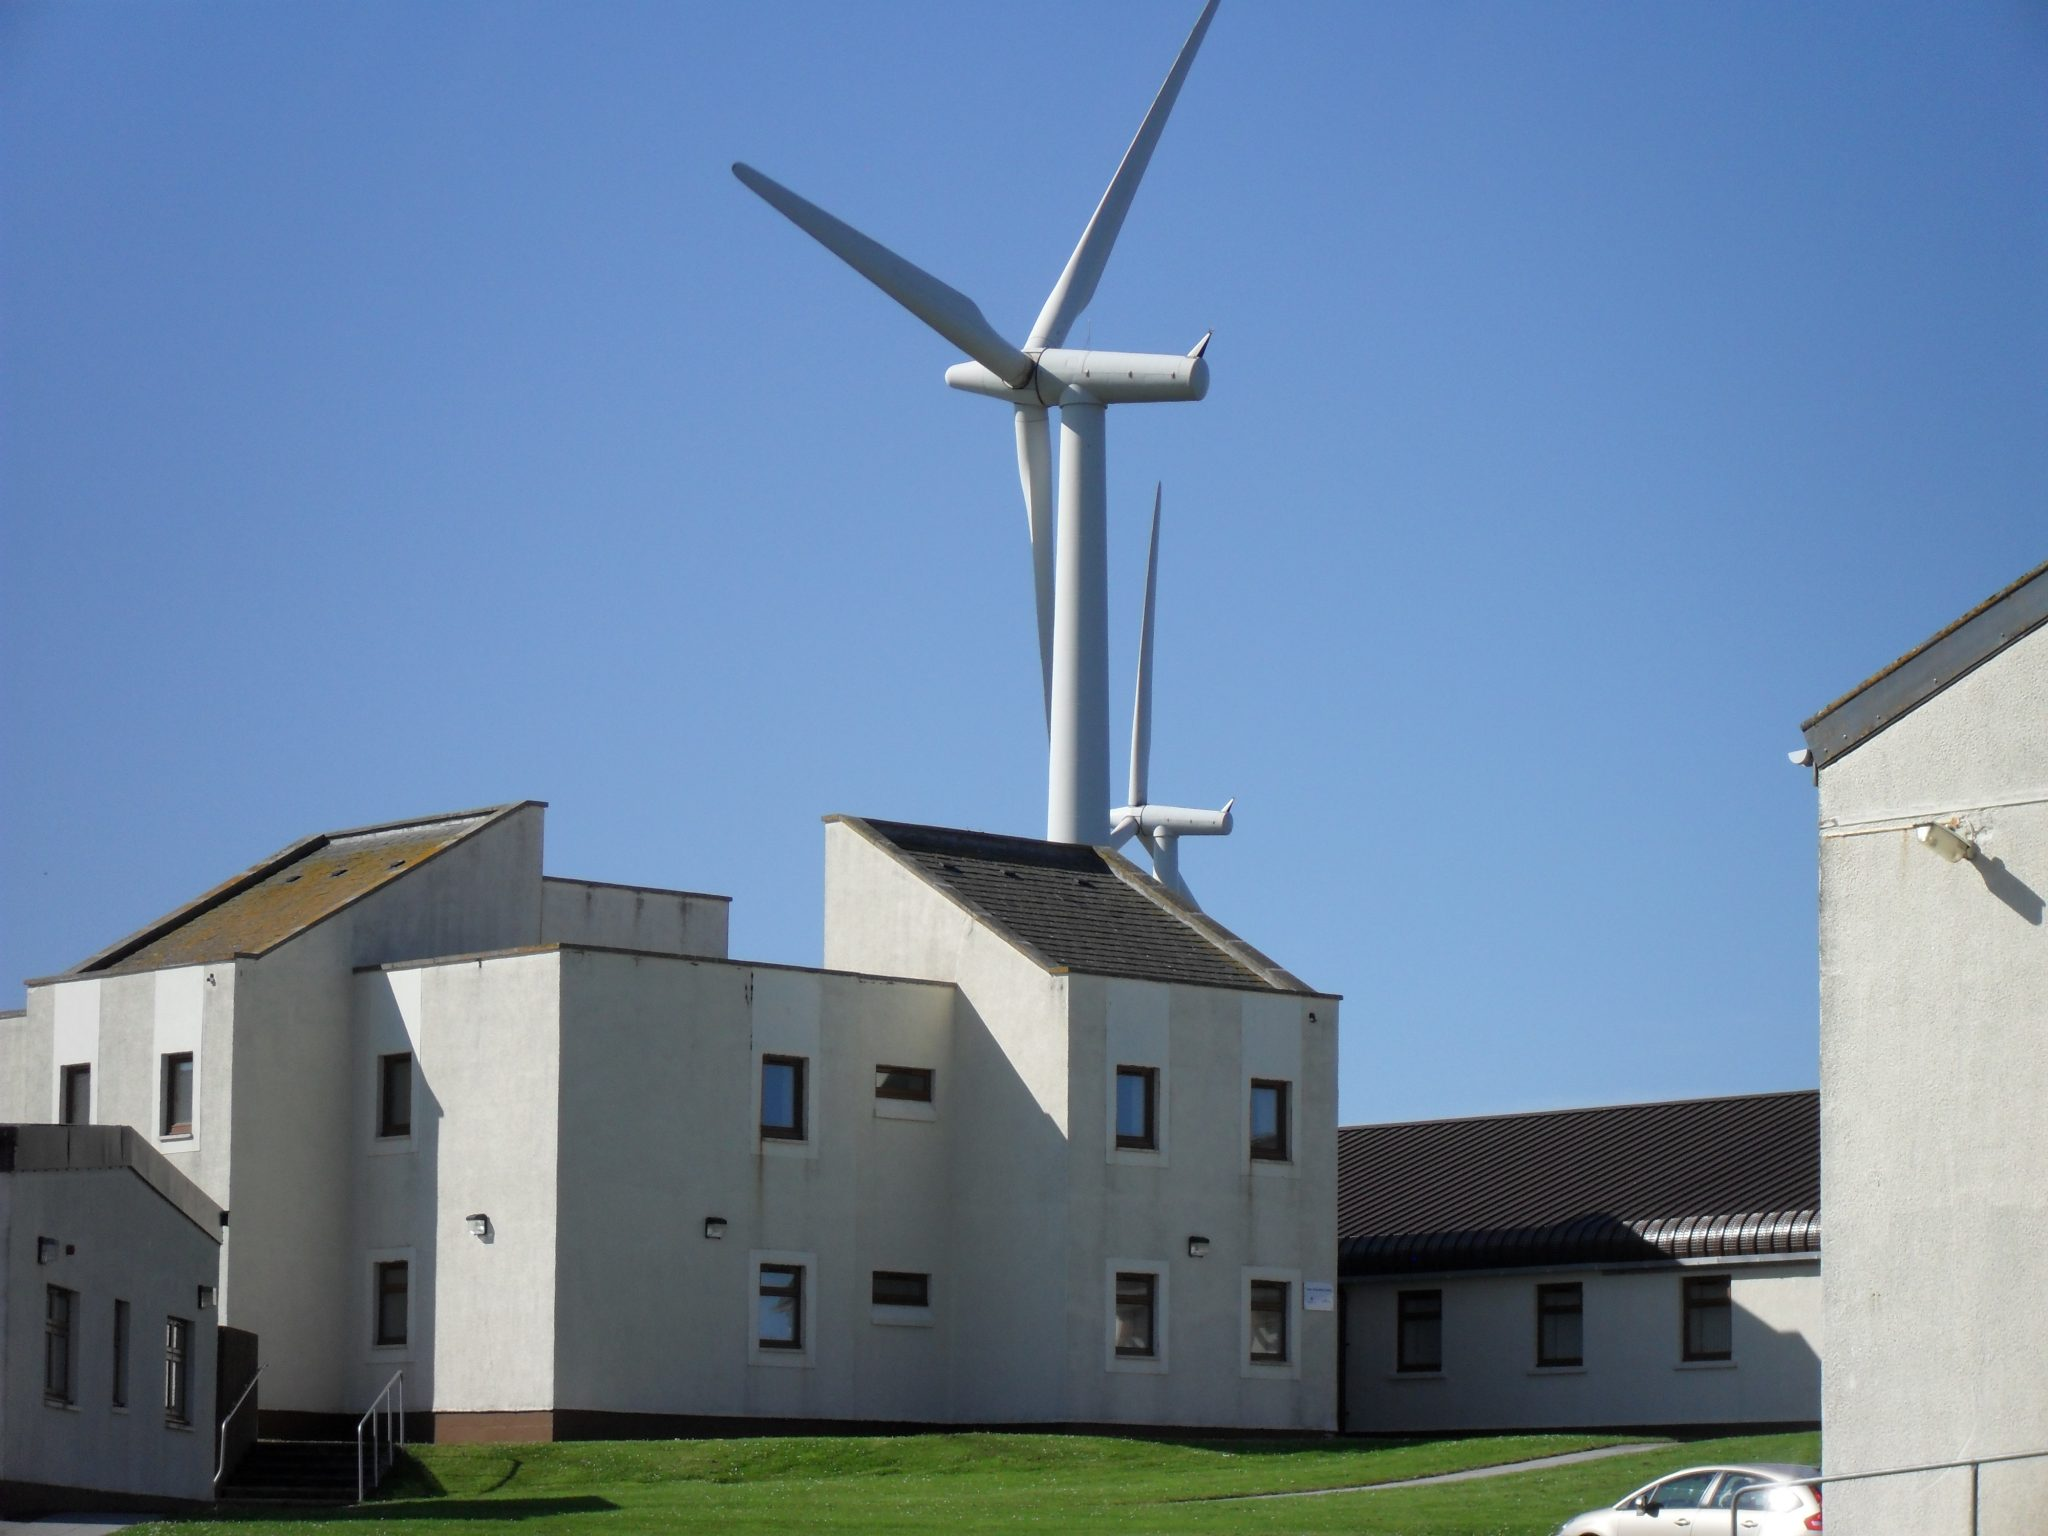 B6 and turbine